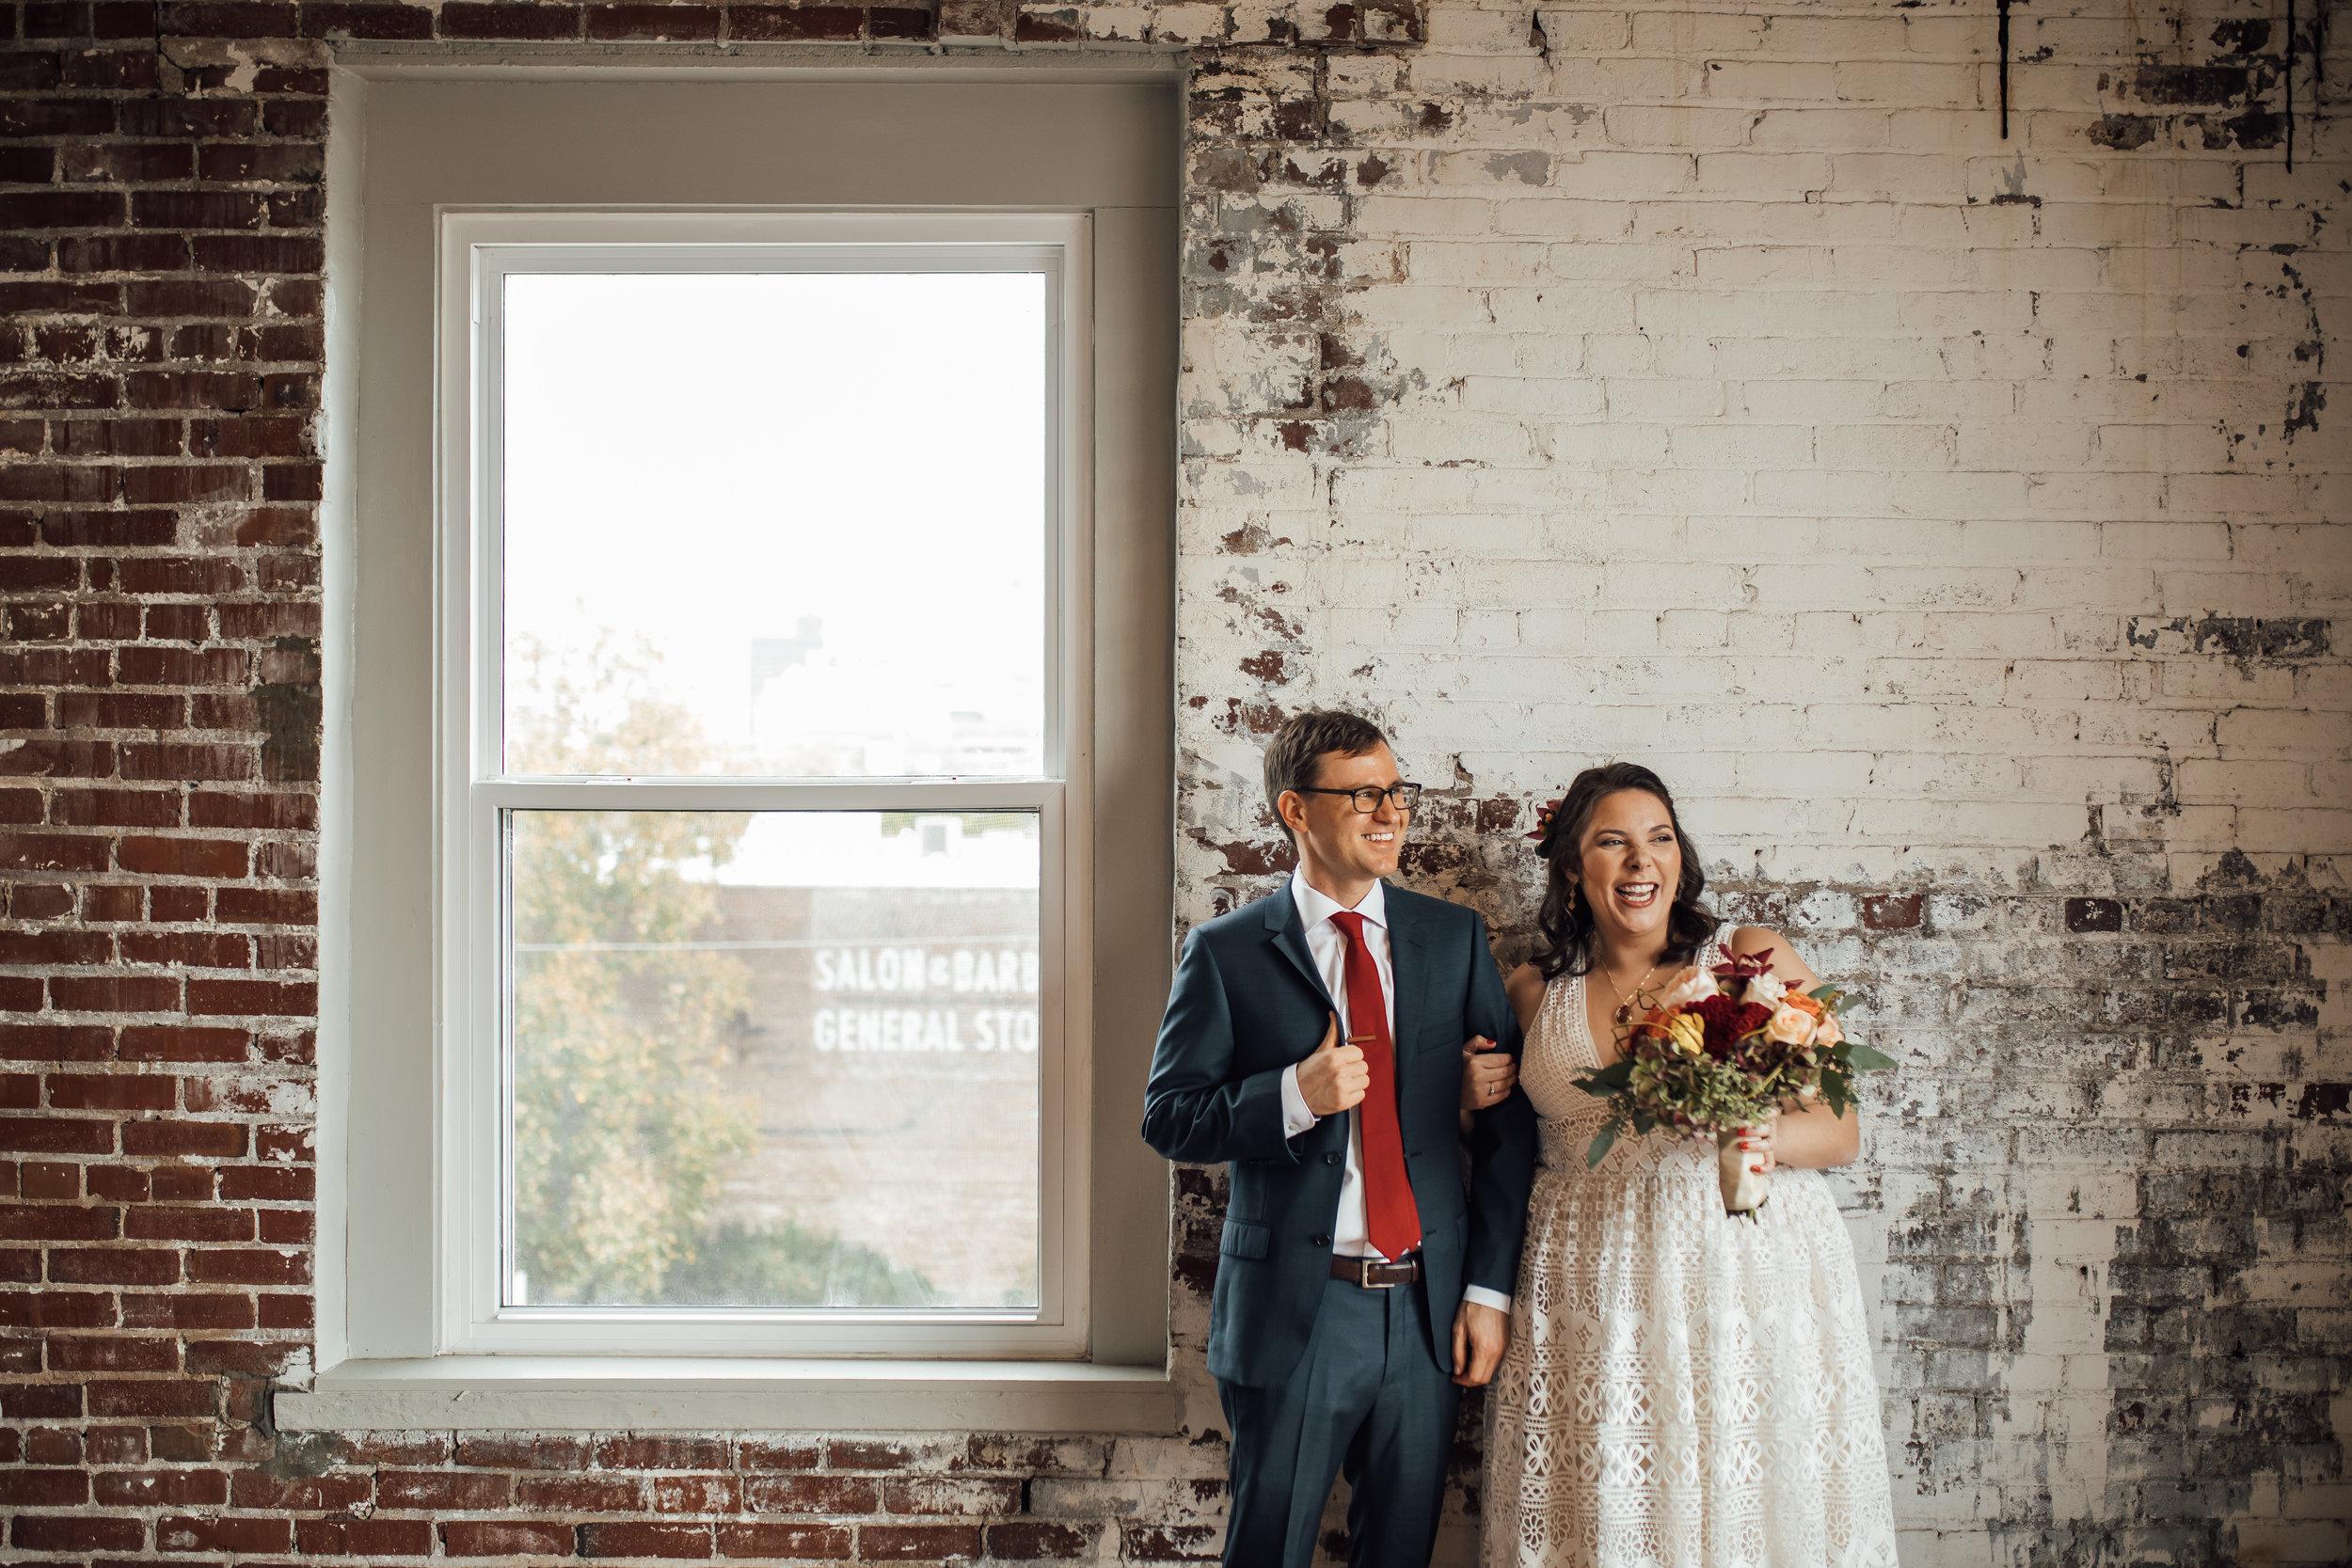 memphis-wedding-photographer-409-s-main-street-memphis-wedding-venue-cassie-cook-photography-susan-cooper-345.jpg